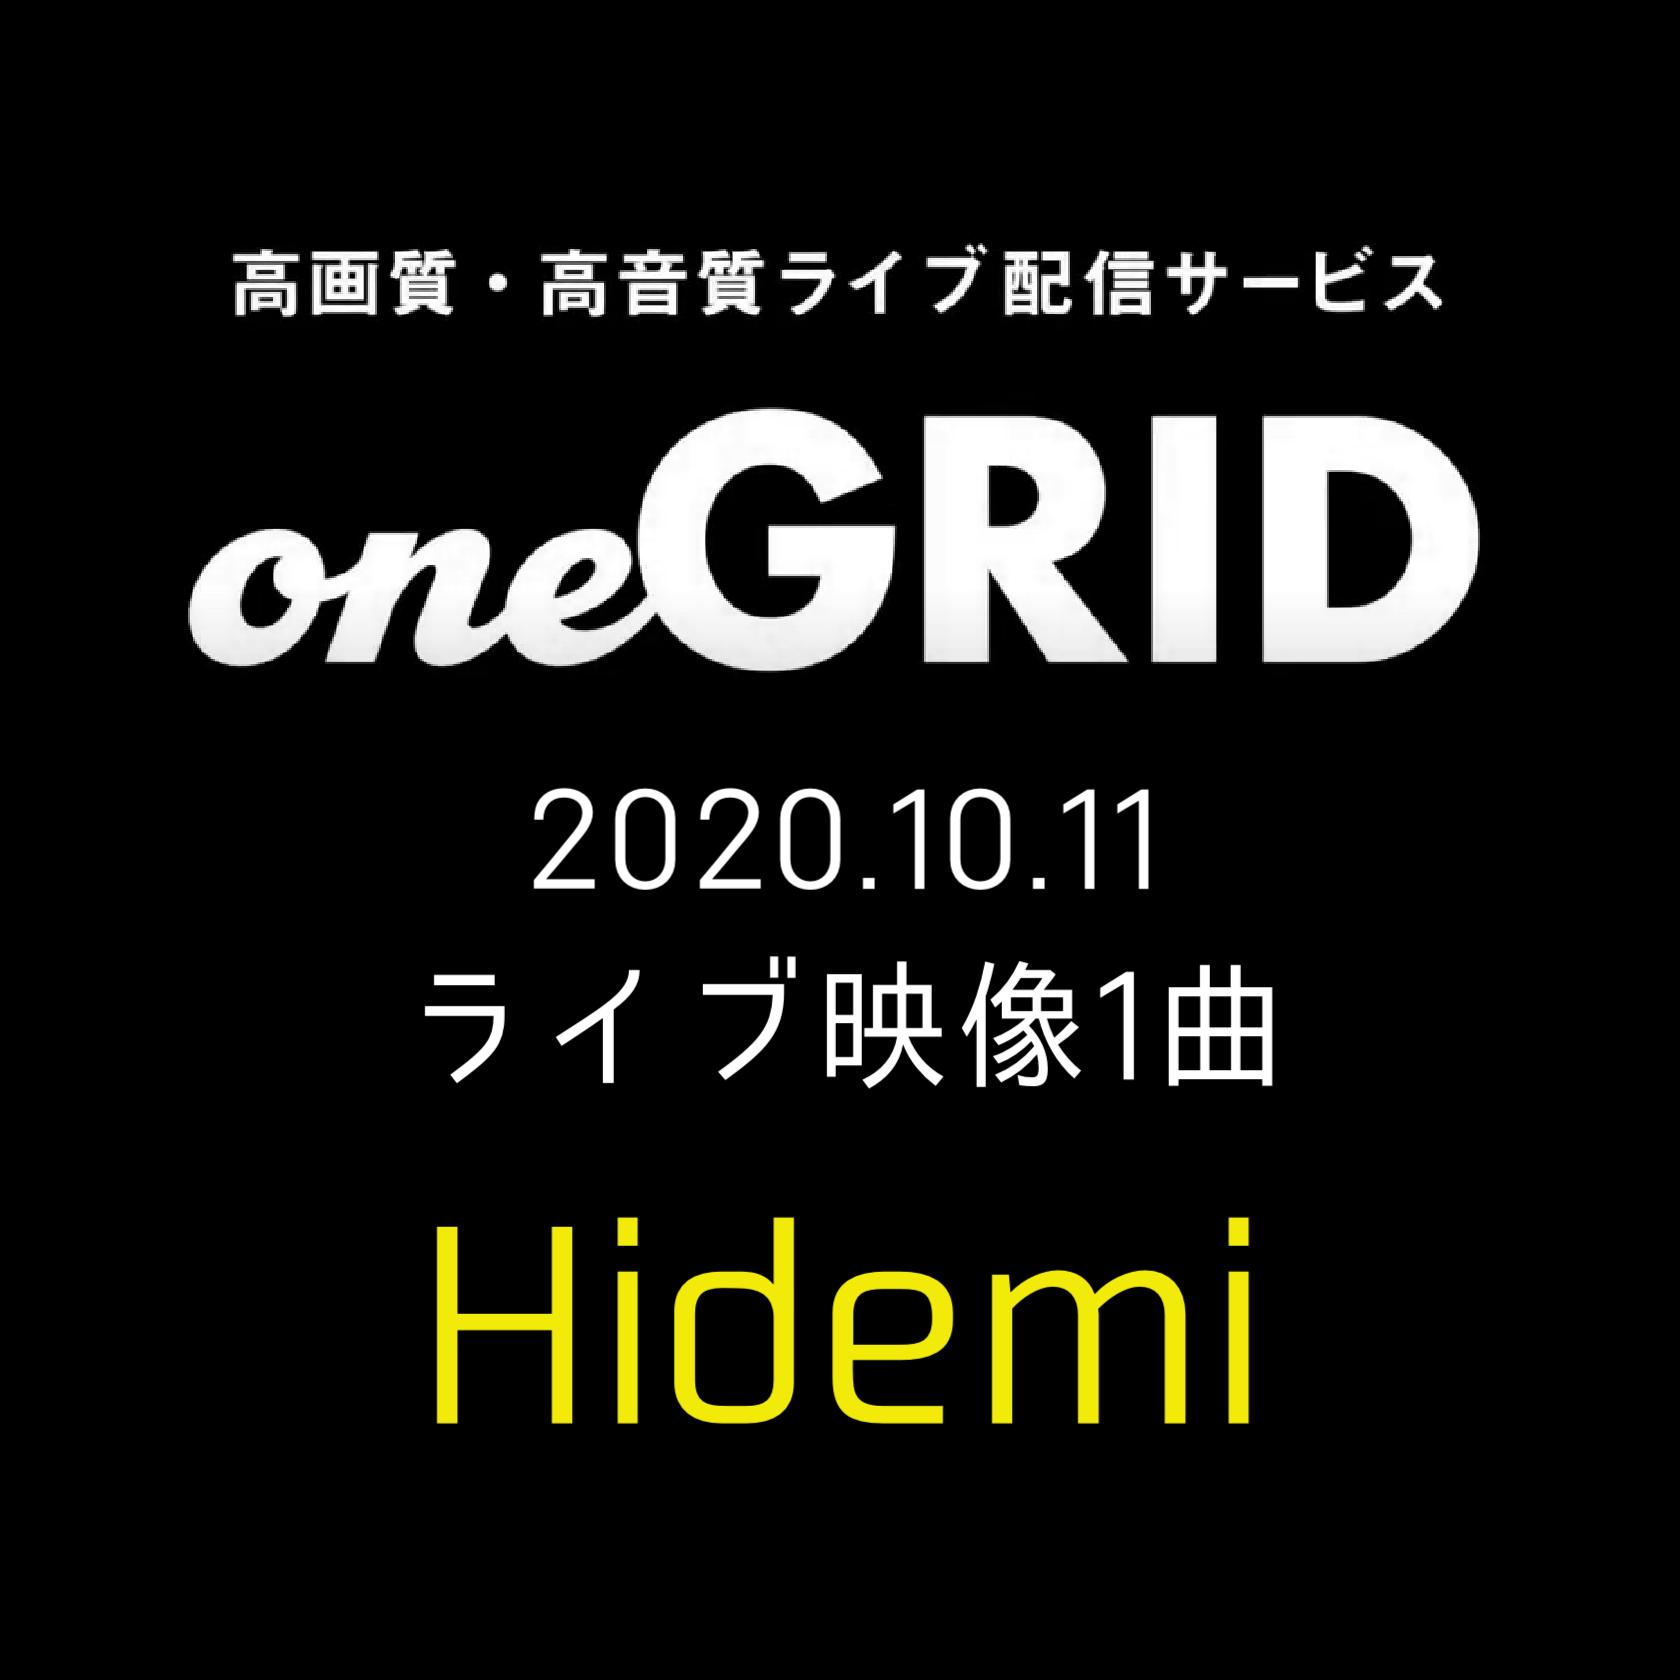 10/11 Hidemi ライブ映像